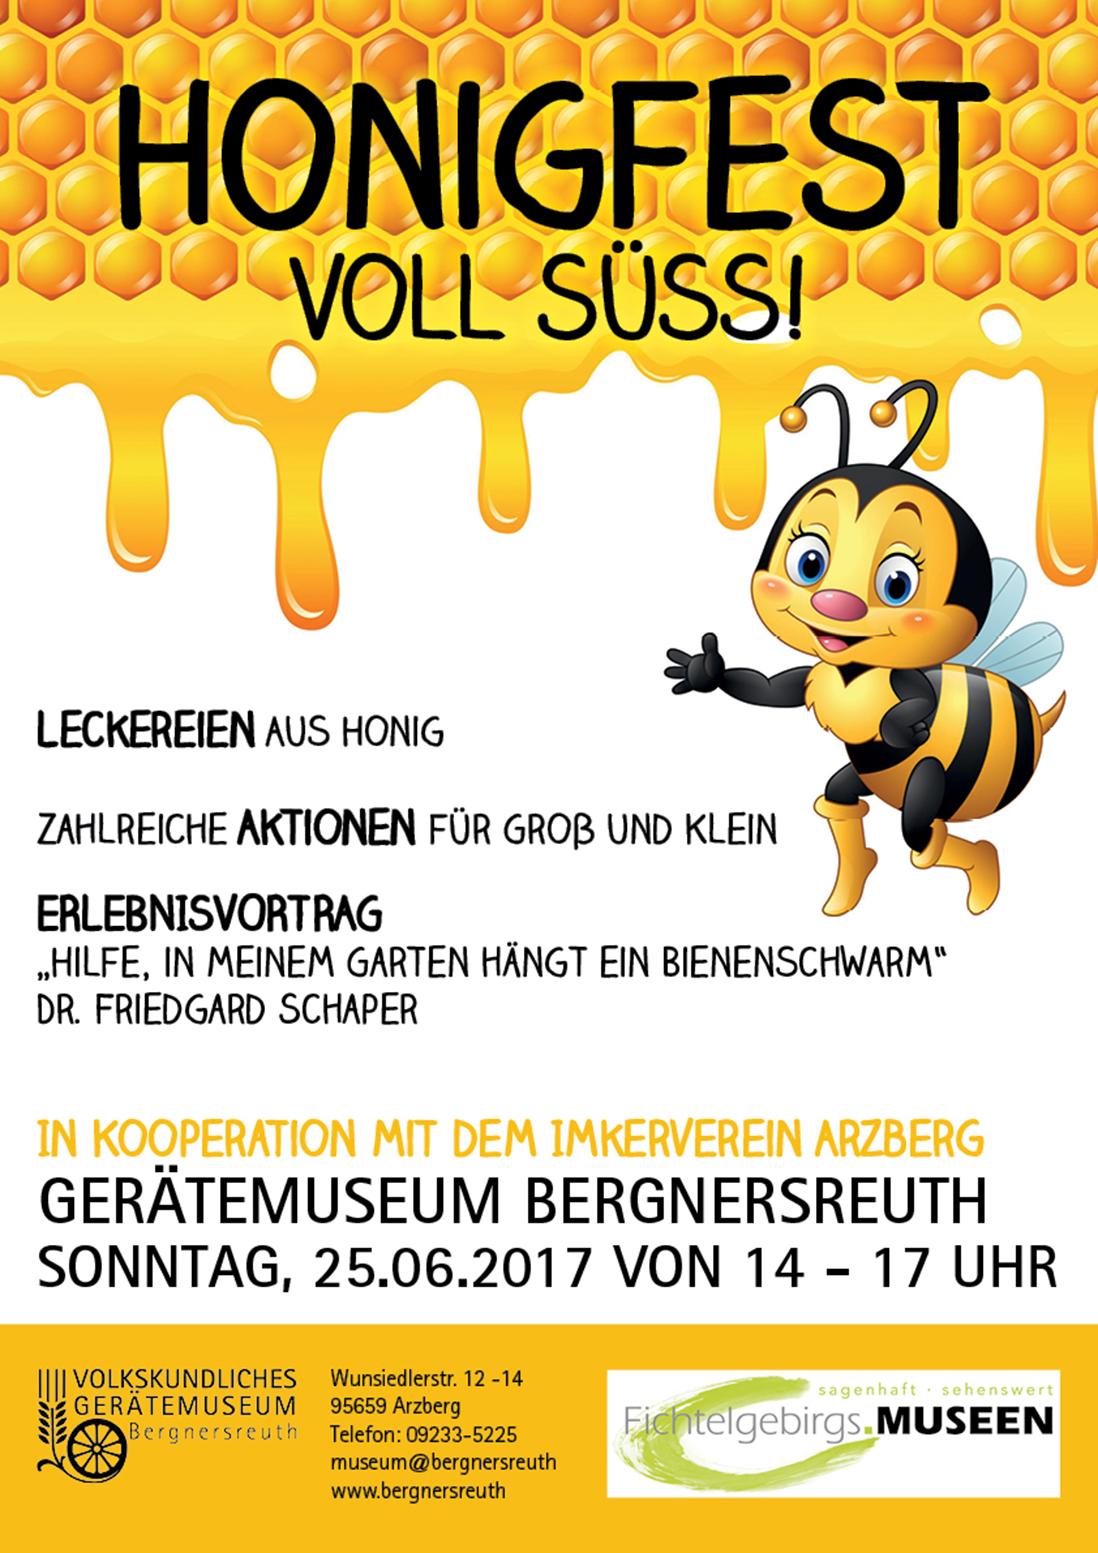 plakat-honigfest-a3-17.05